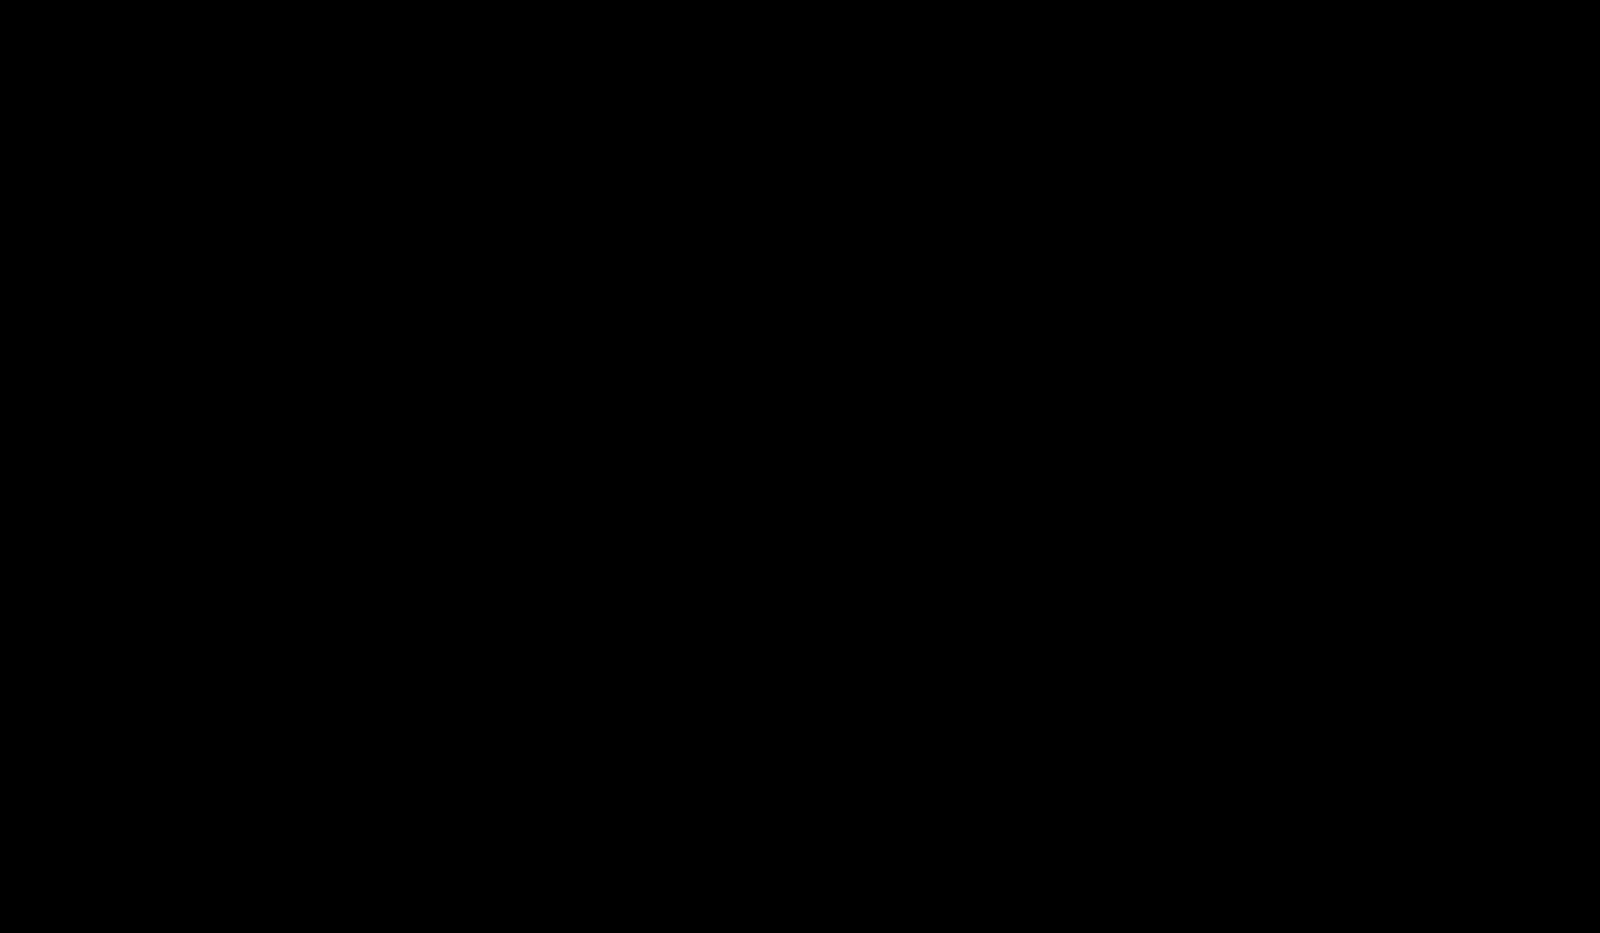 /developer-spotlight-yew-wee-chua-e12855b8f40c feature image